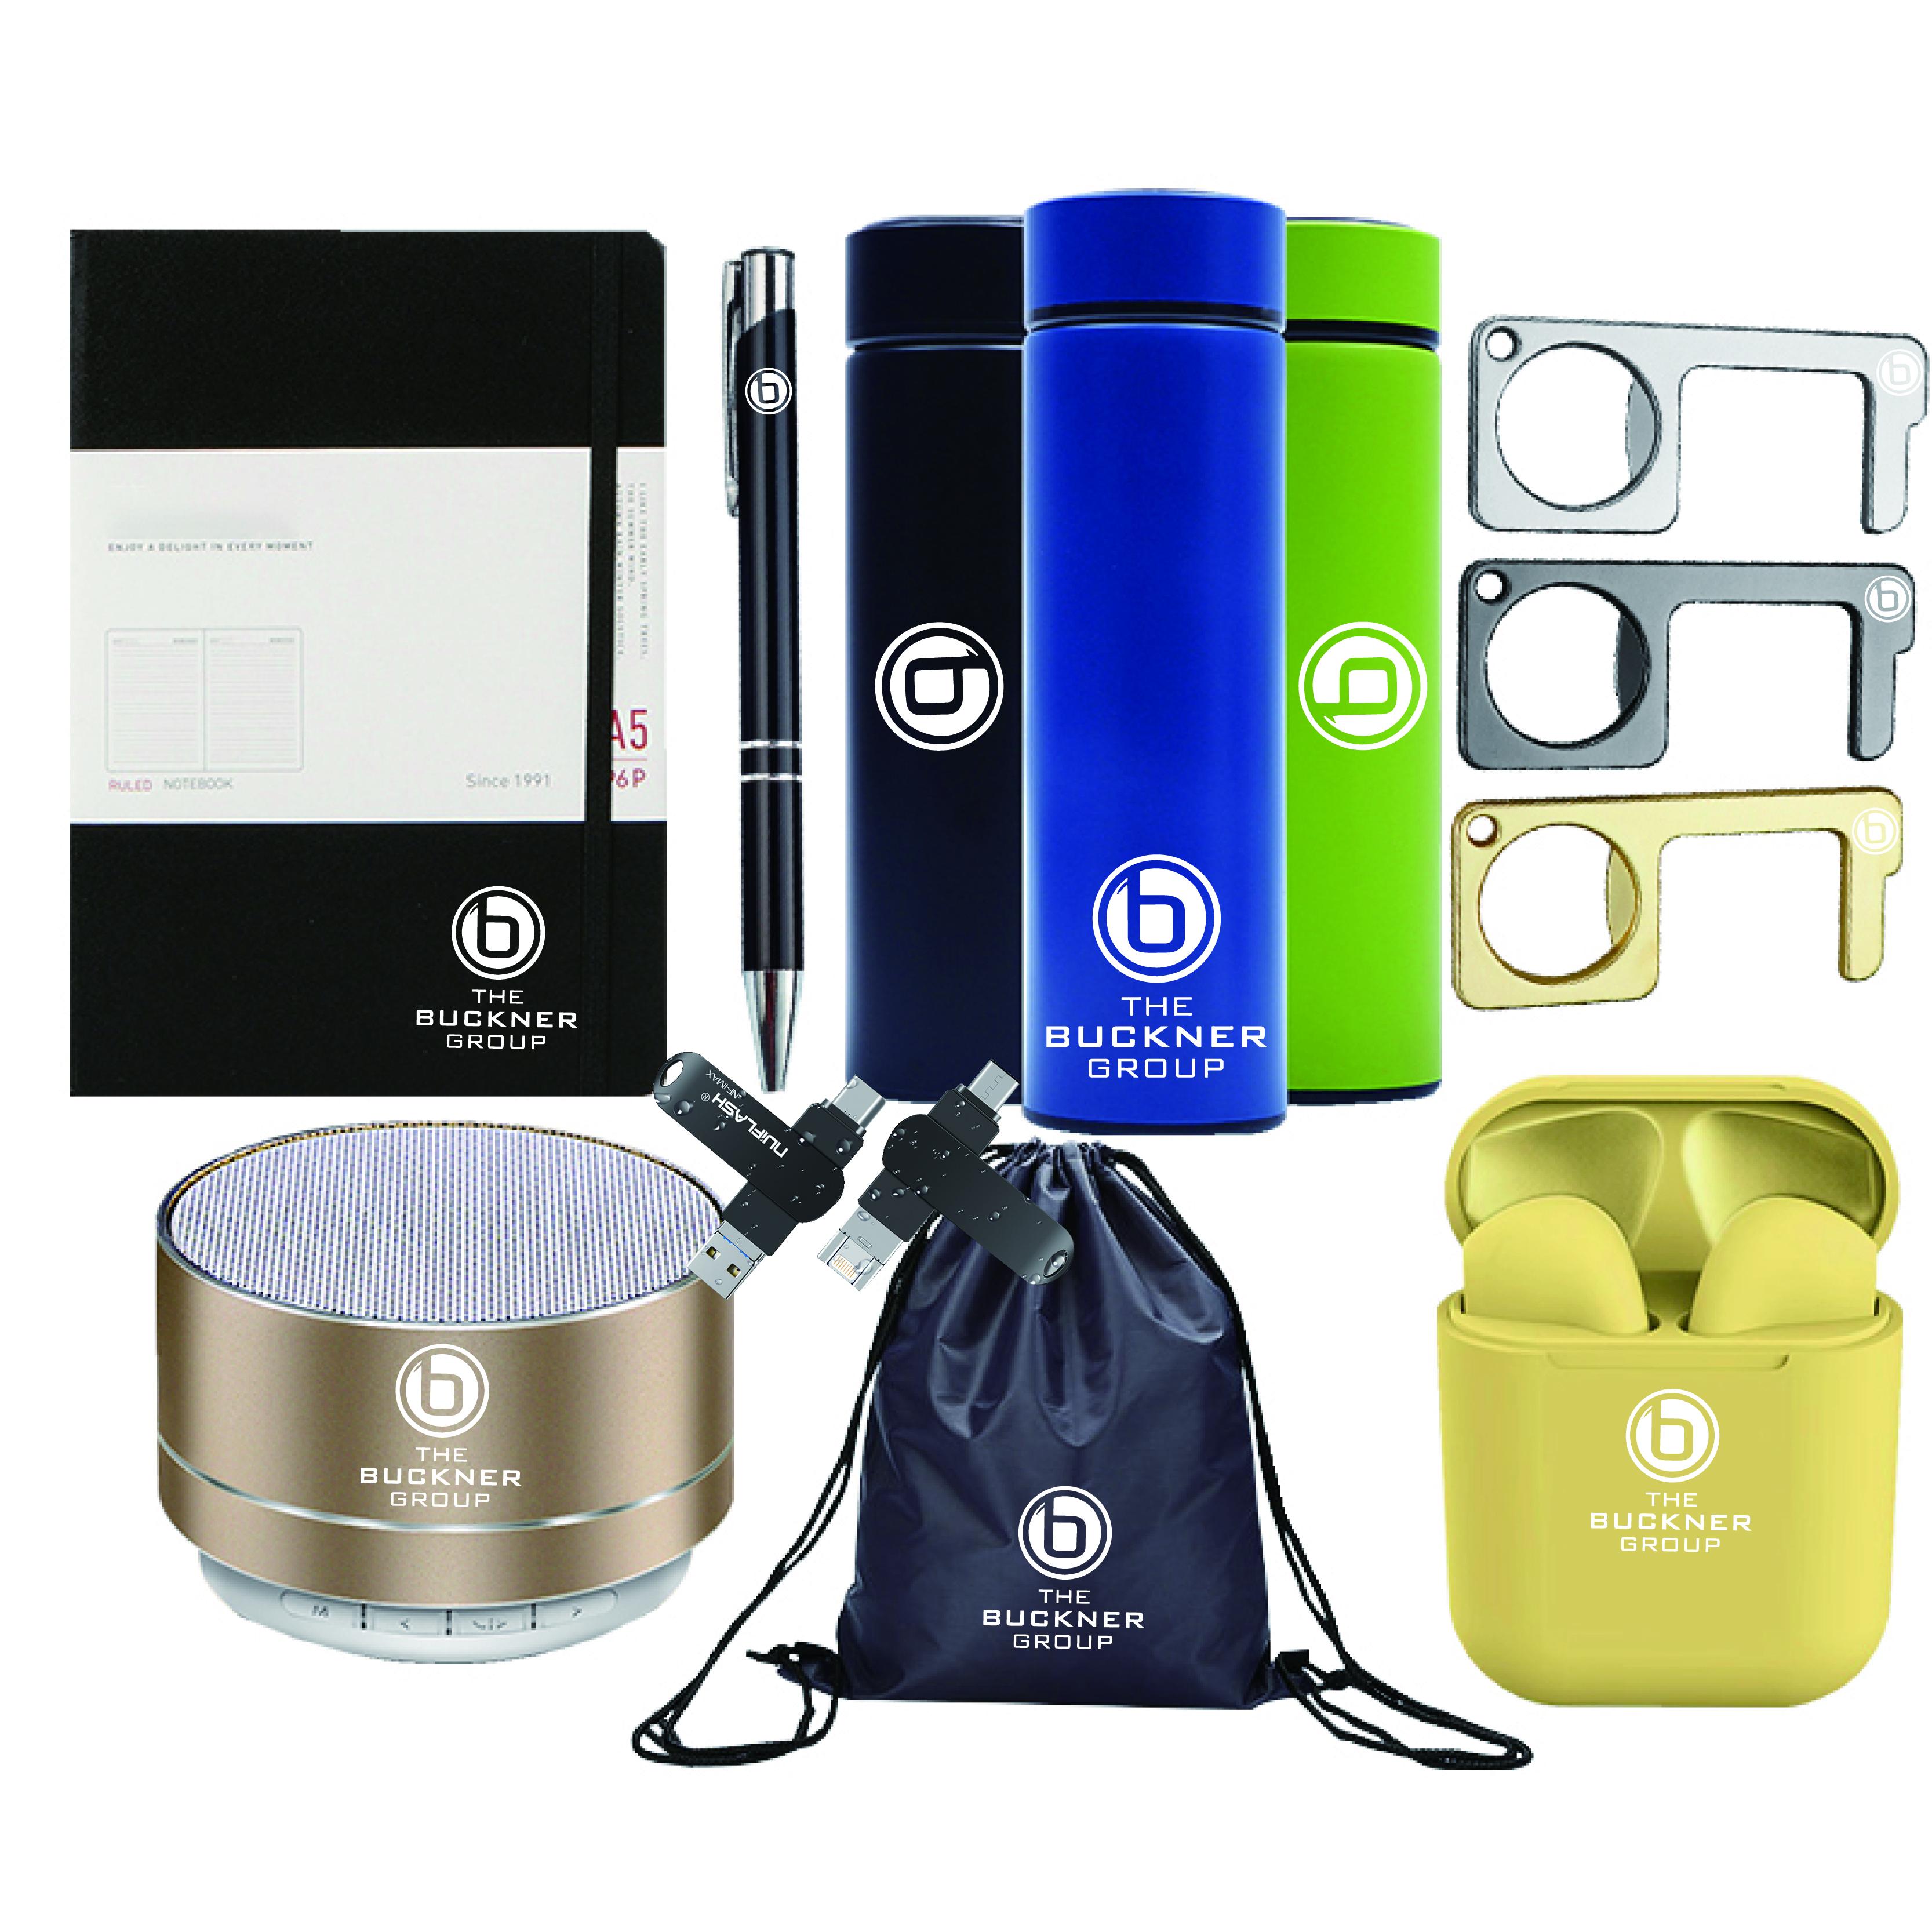 2020 Merchandising Pemasaran Promosi Hadiah Item Kantor Perusahaan Souvenir Ulang Tahun Hadiah